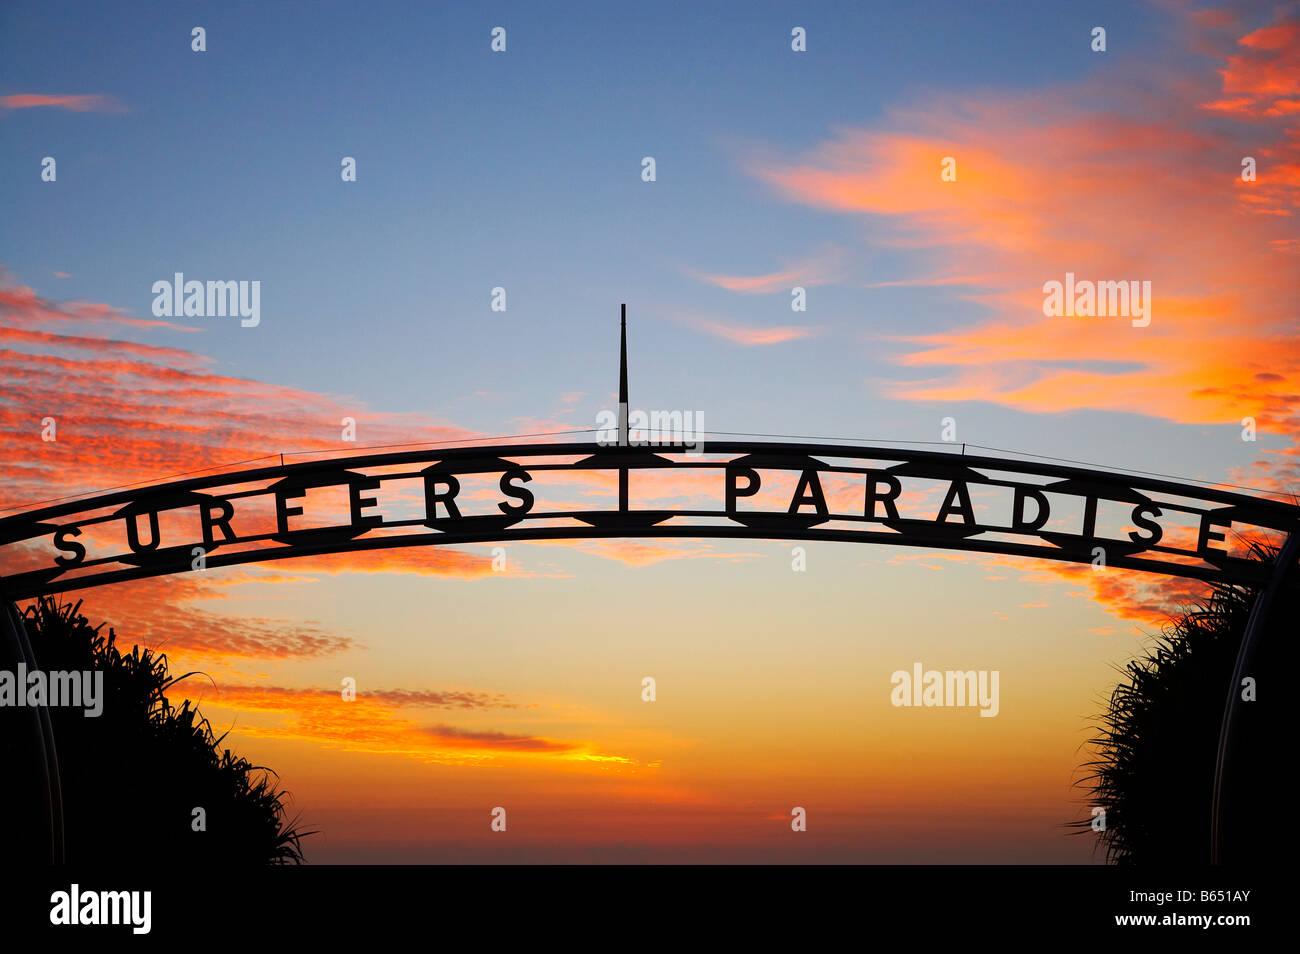 Sunrise Surfers Paradise Gold Coast Queensland Australia